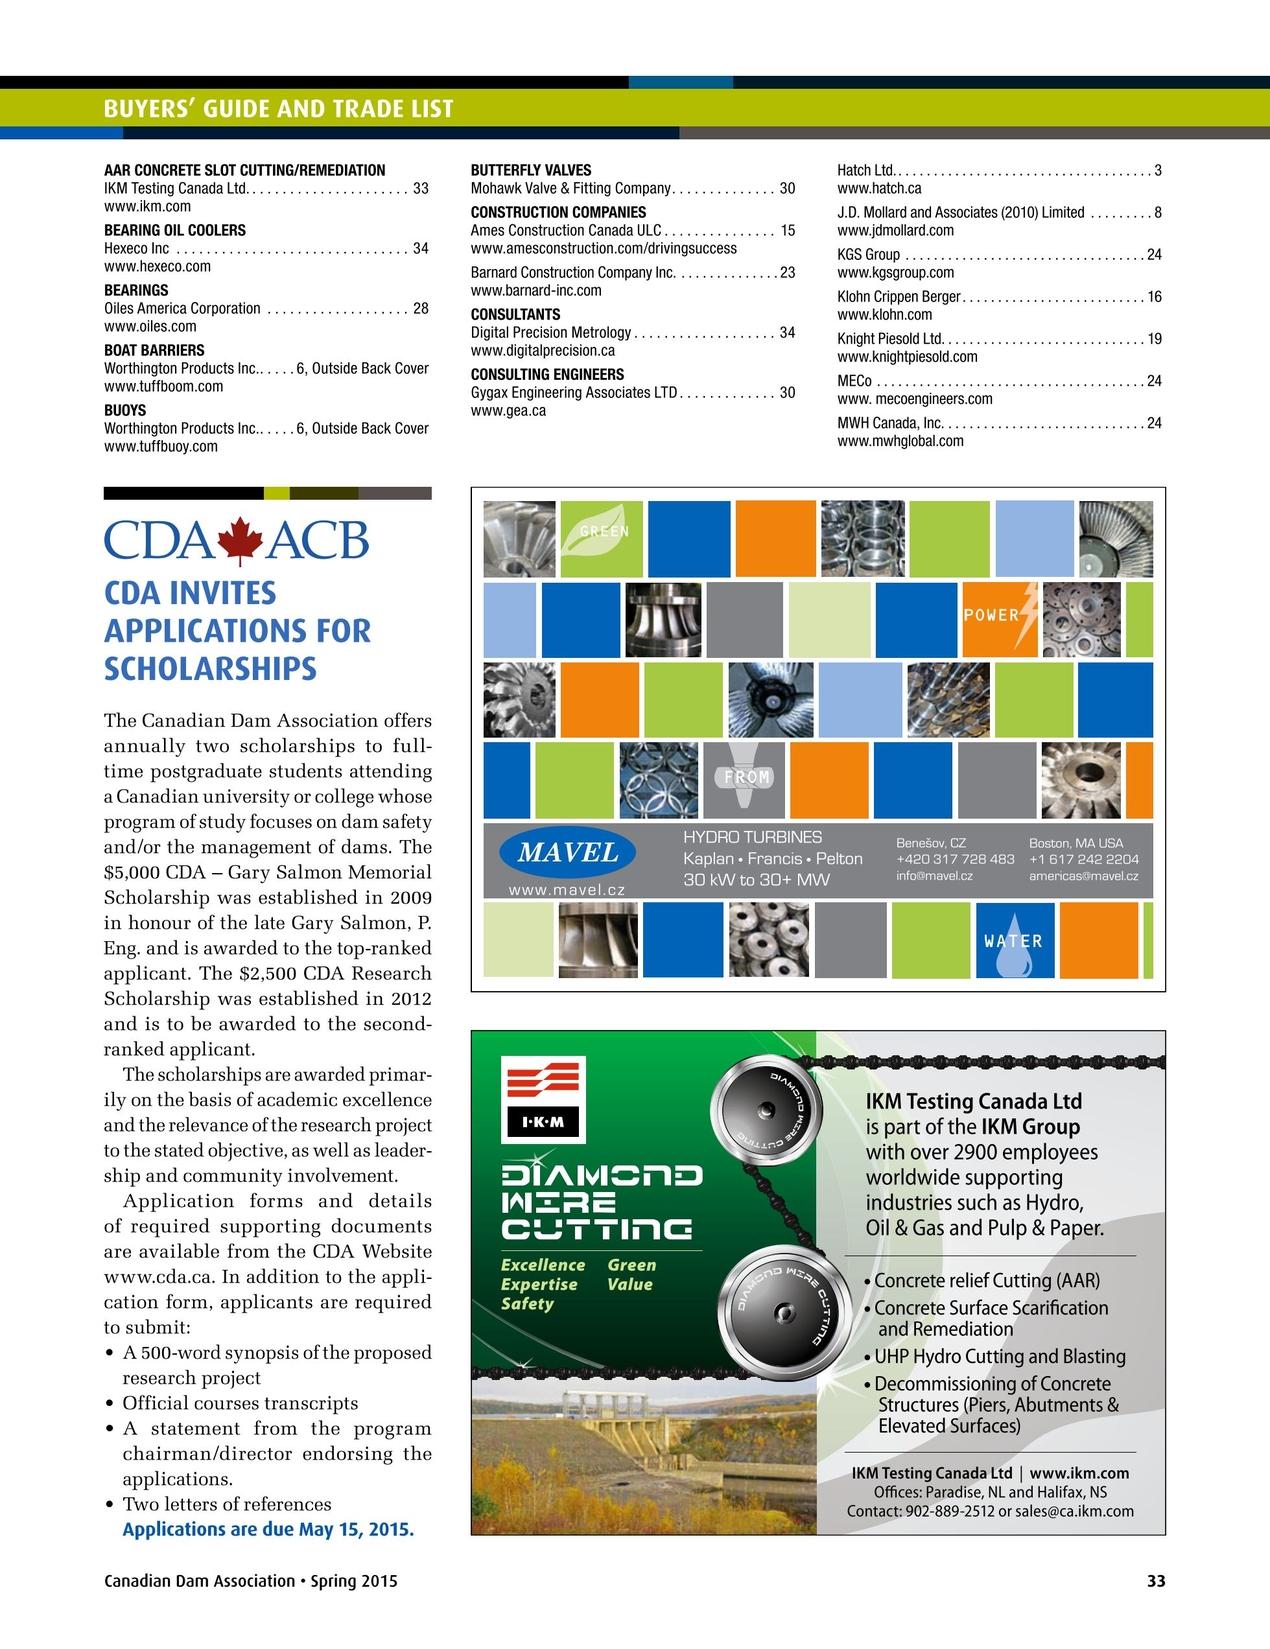 Canadian Dam Association Bulletin - Spring 2015